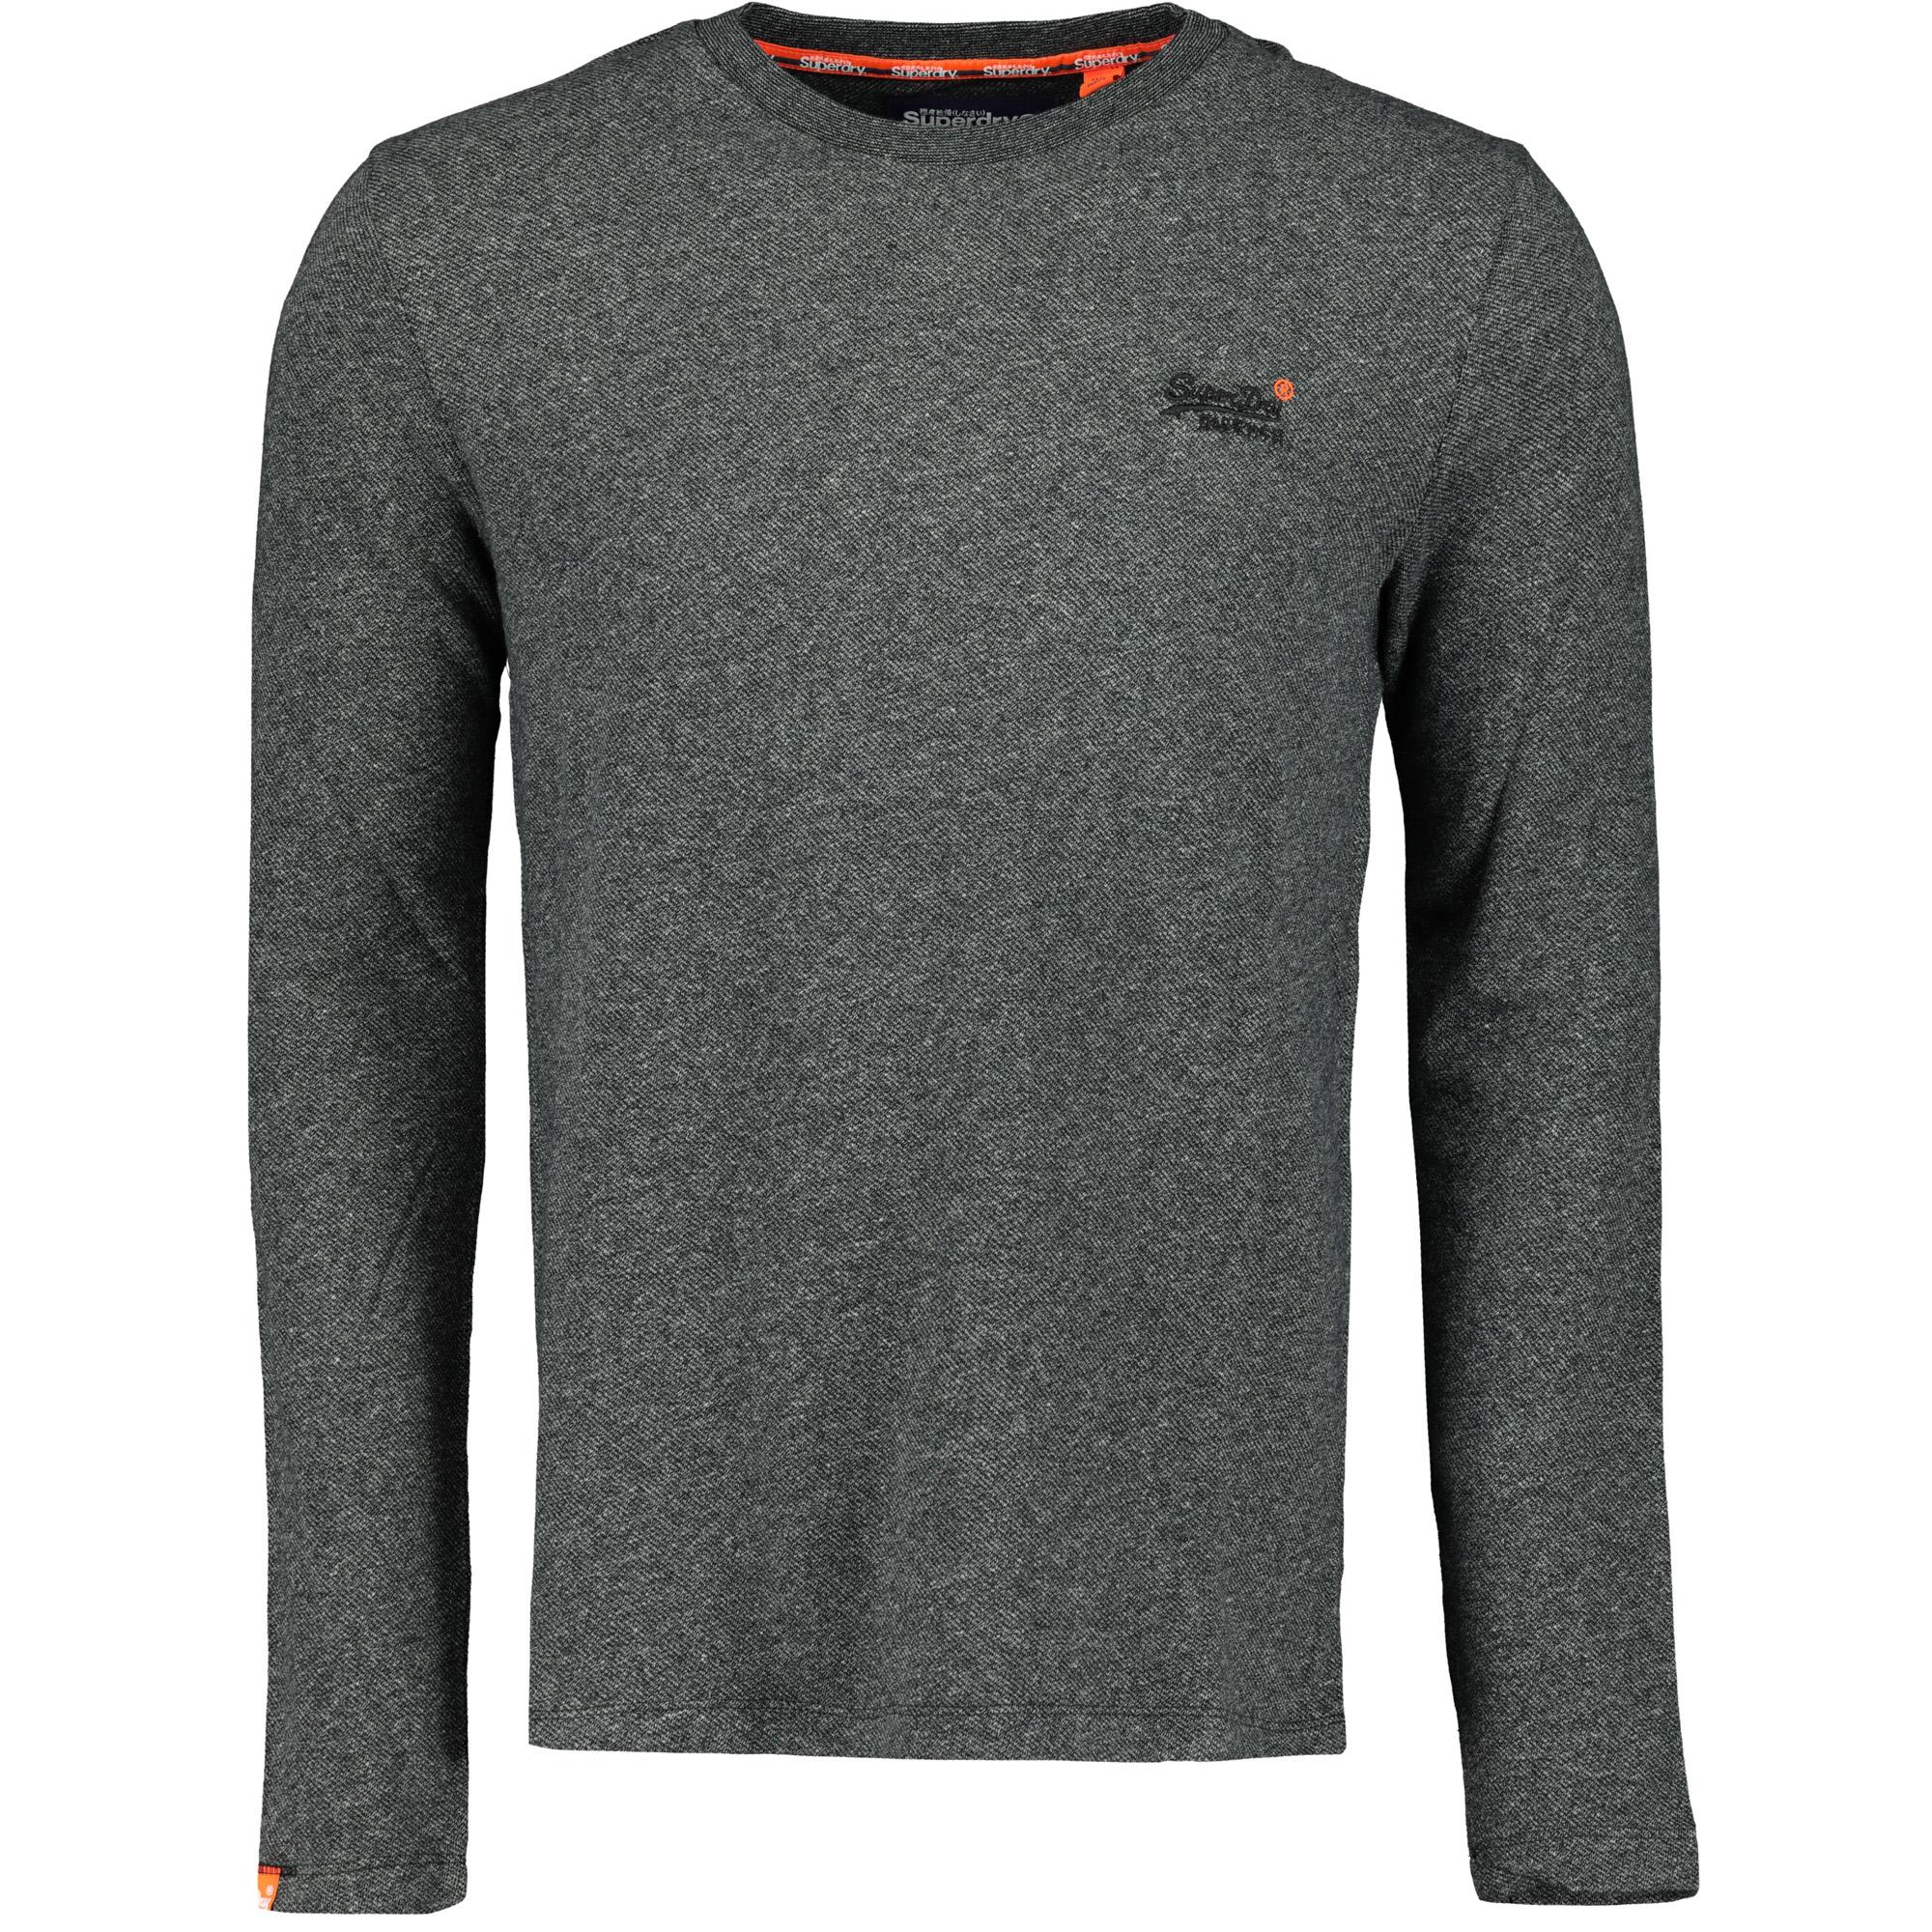 uk availability ed968 153ed Superdry Orange Label Twill Texture LS Herren Pullover basalt grey twill  Men Pullover & Sweats Rundhalspullover